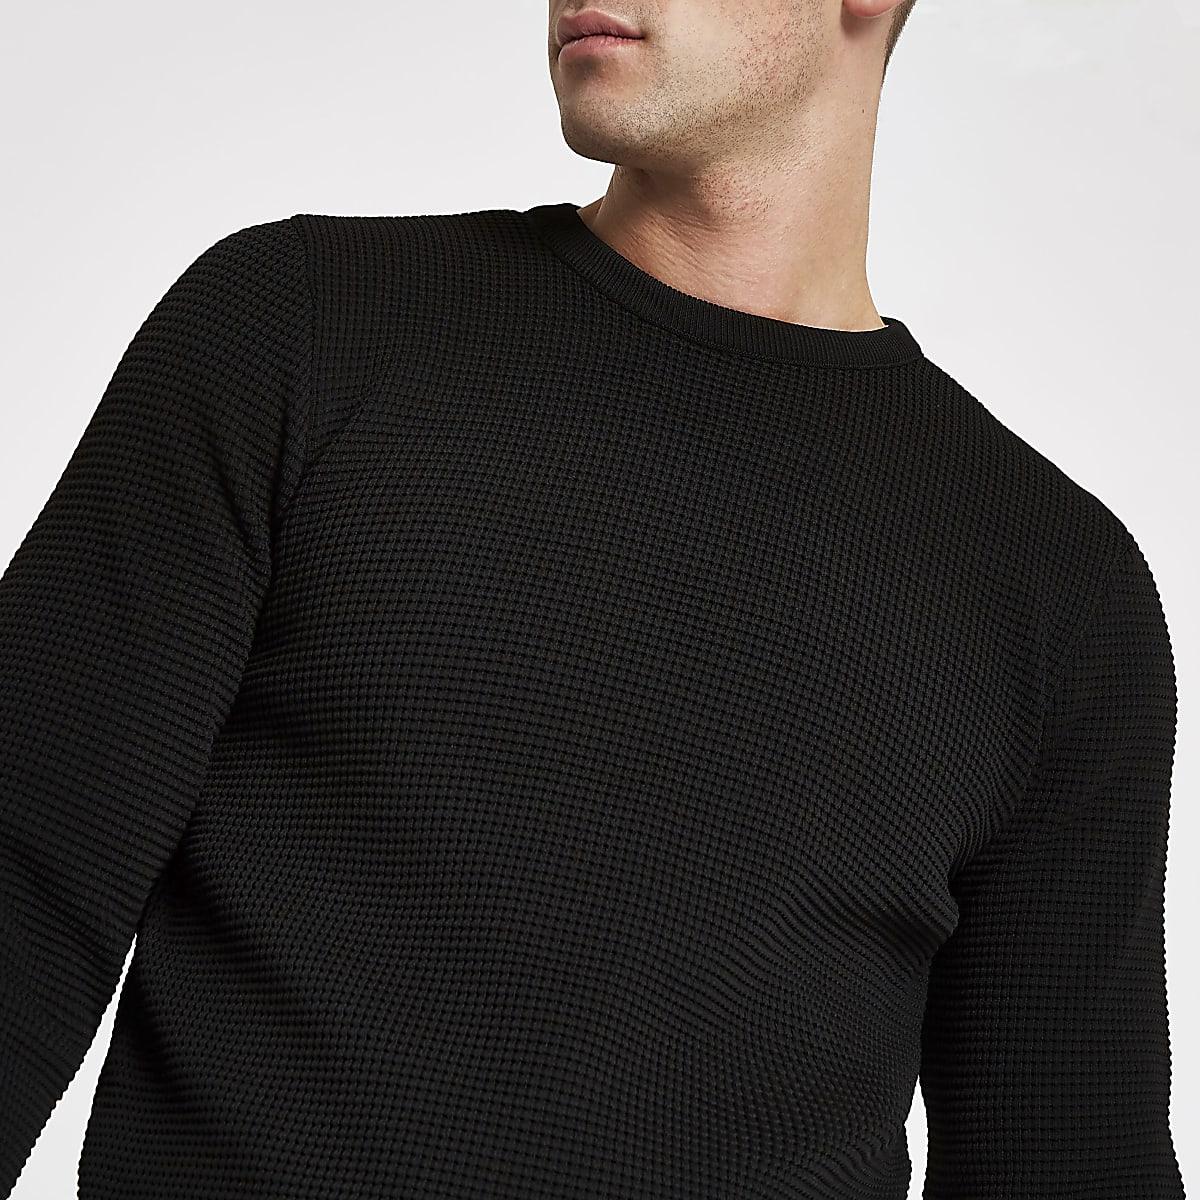 f42864287a6 Black textured knit slim fit jumper - Jumpers - Jumpers   Cardigans ...